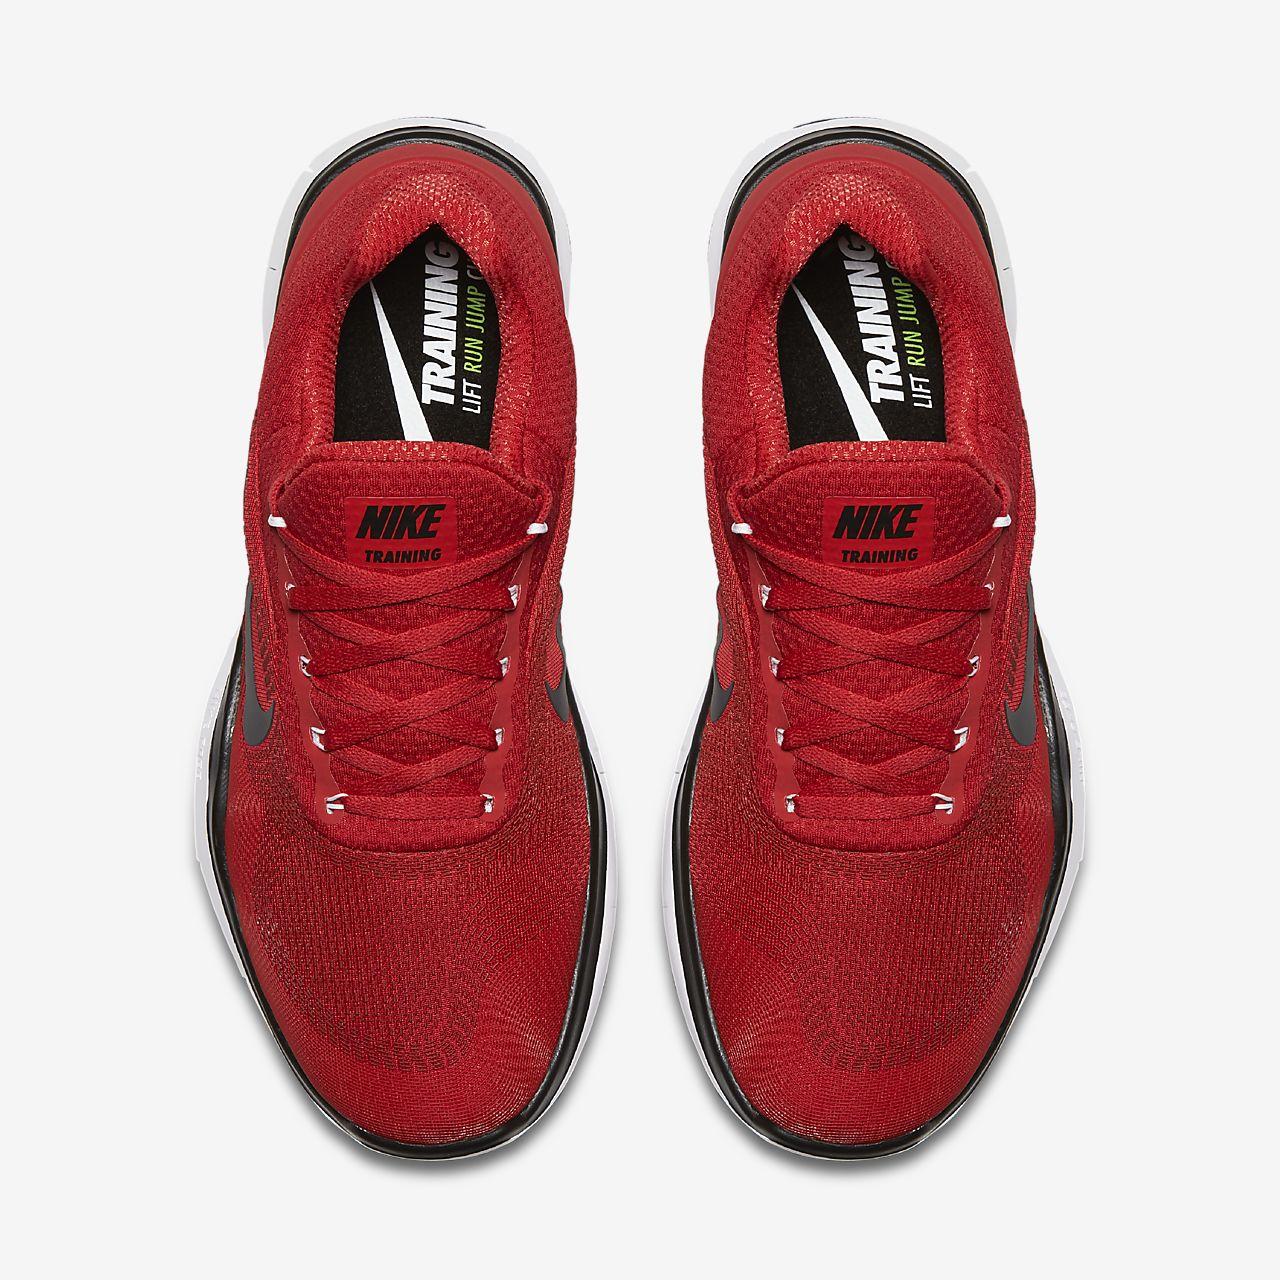 ... Nike Free Trainer V7 Men's Bodyweight Training, Gym Shoe